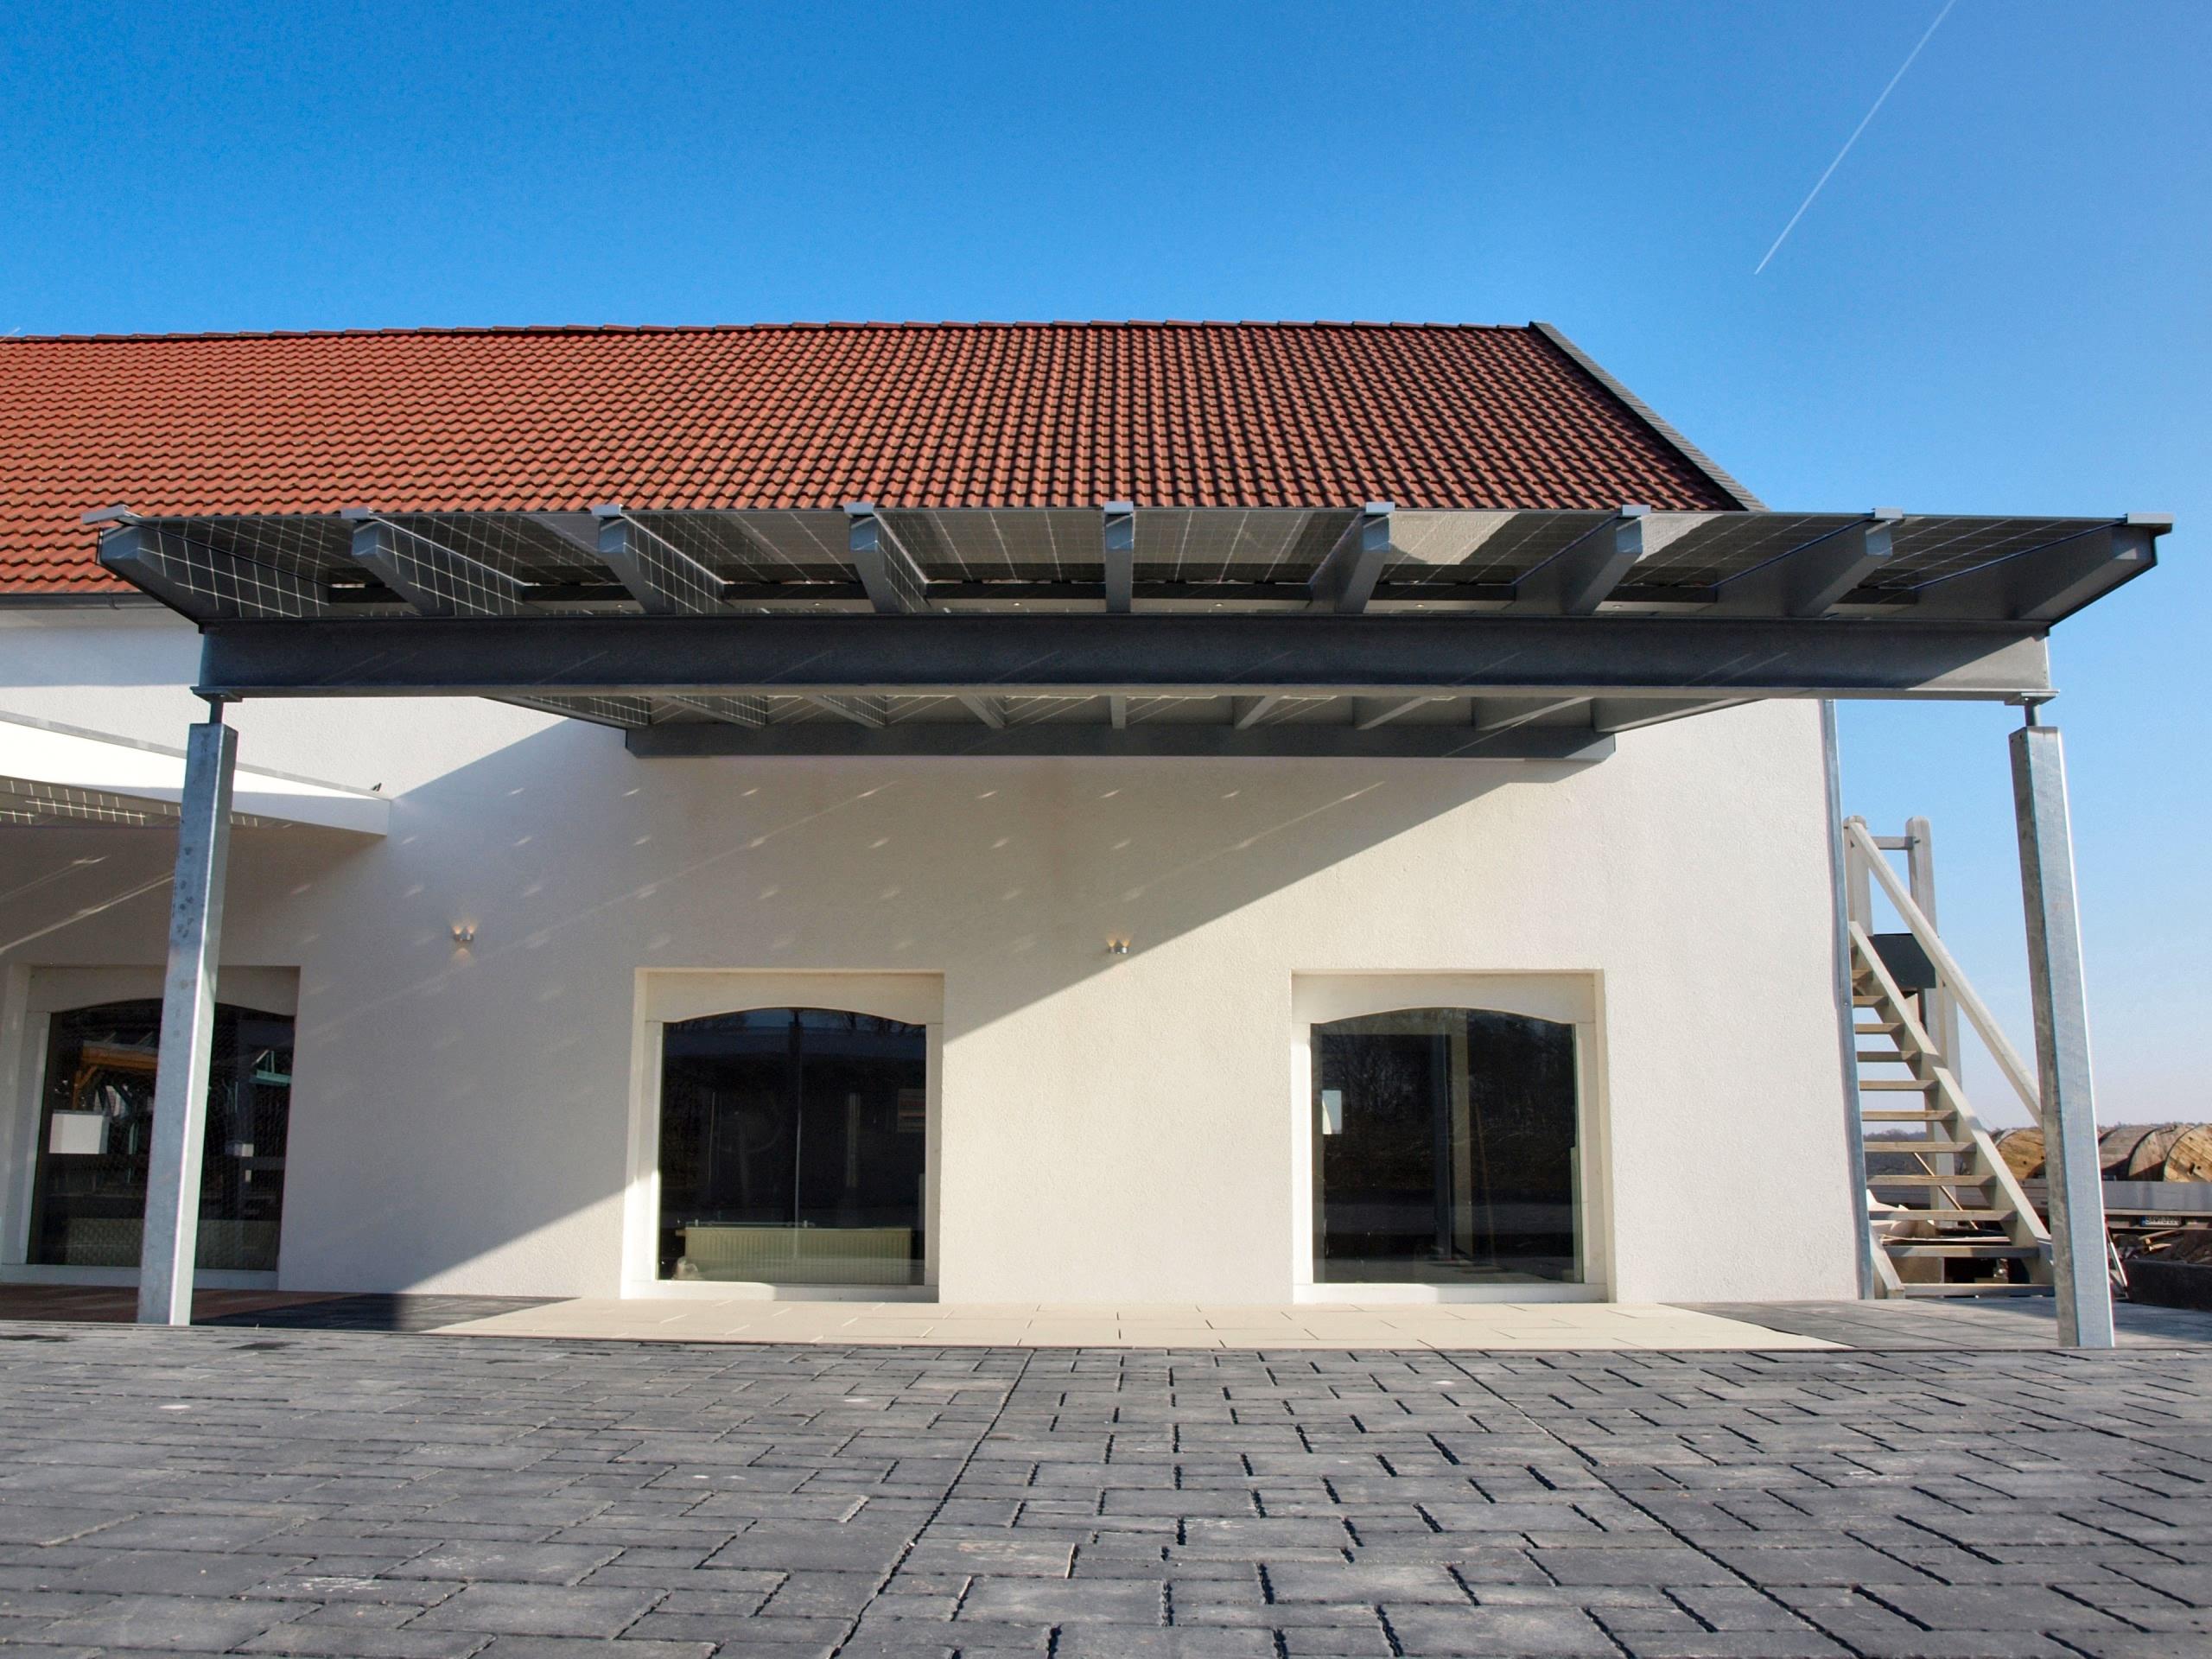 Solarterrasse solarcarport ab 0 aus holz alu oder for Barhocker holz stahl